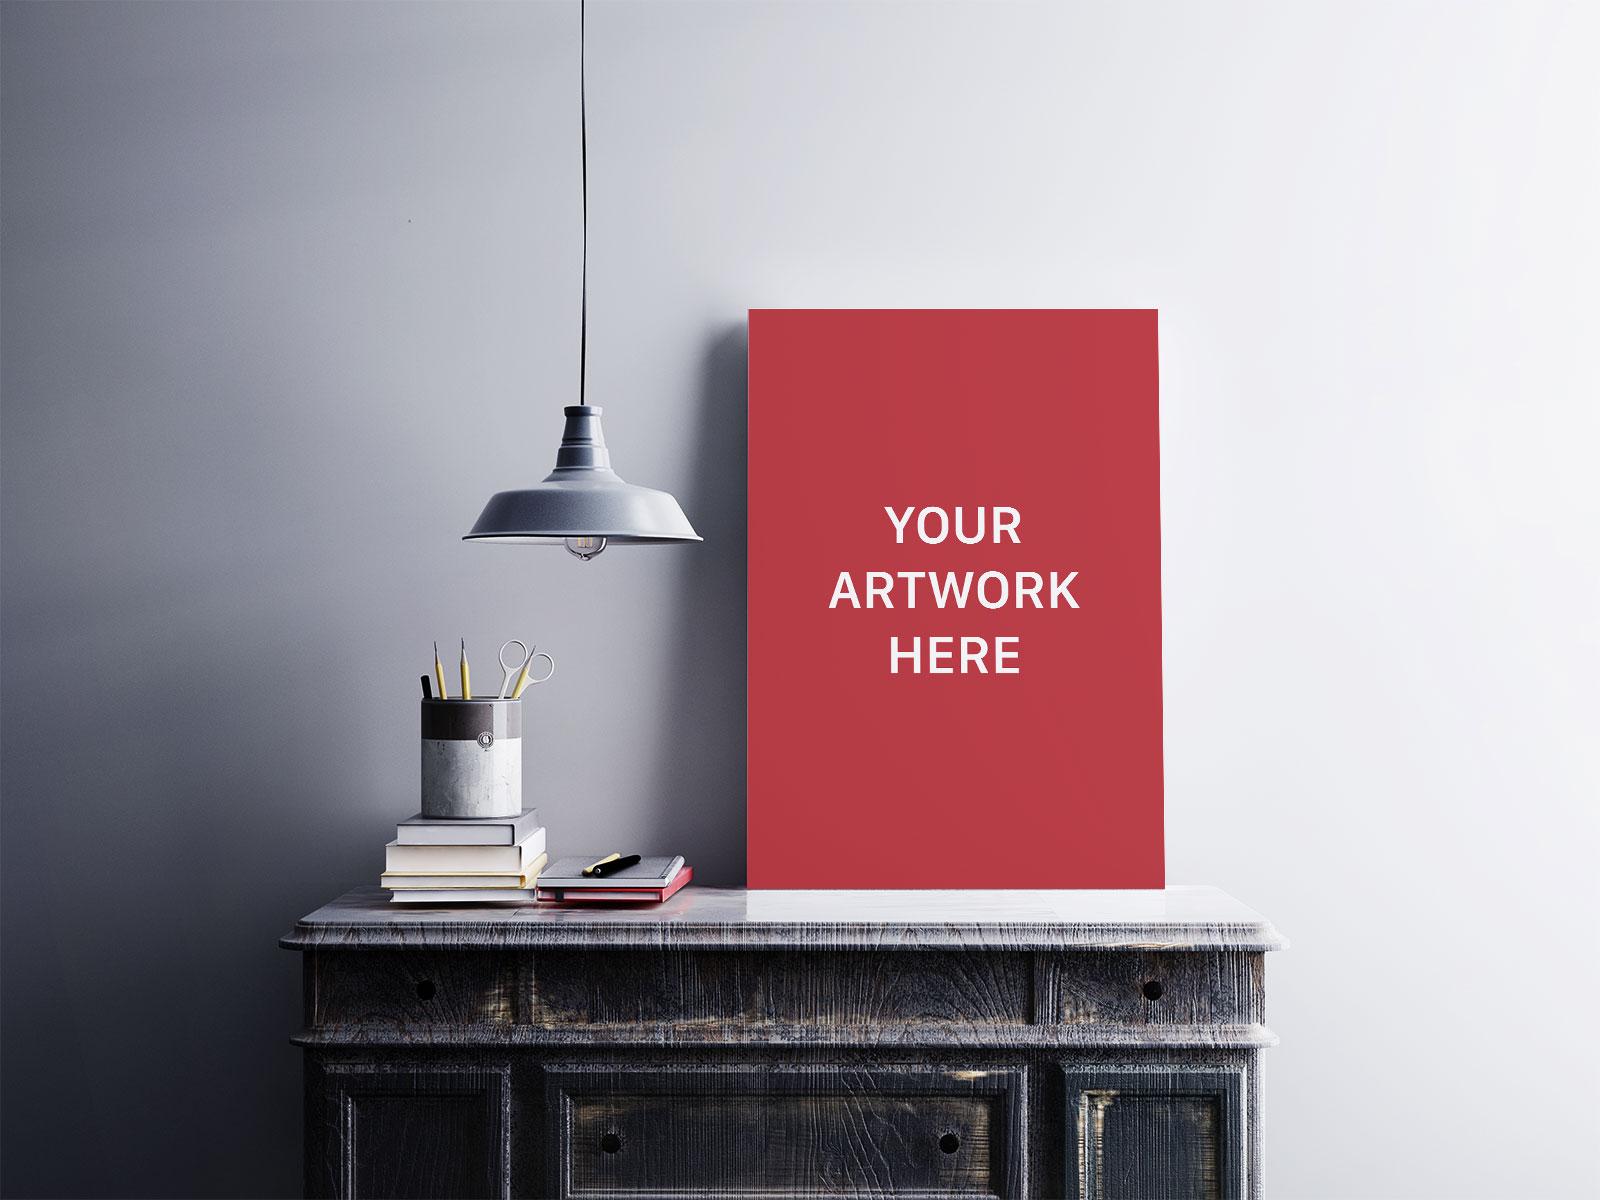 Free-Premium-Quality-Photo-Poster-Frame-Mockup-PSD-File-2